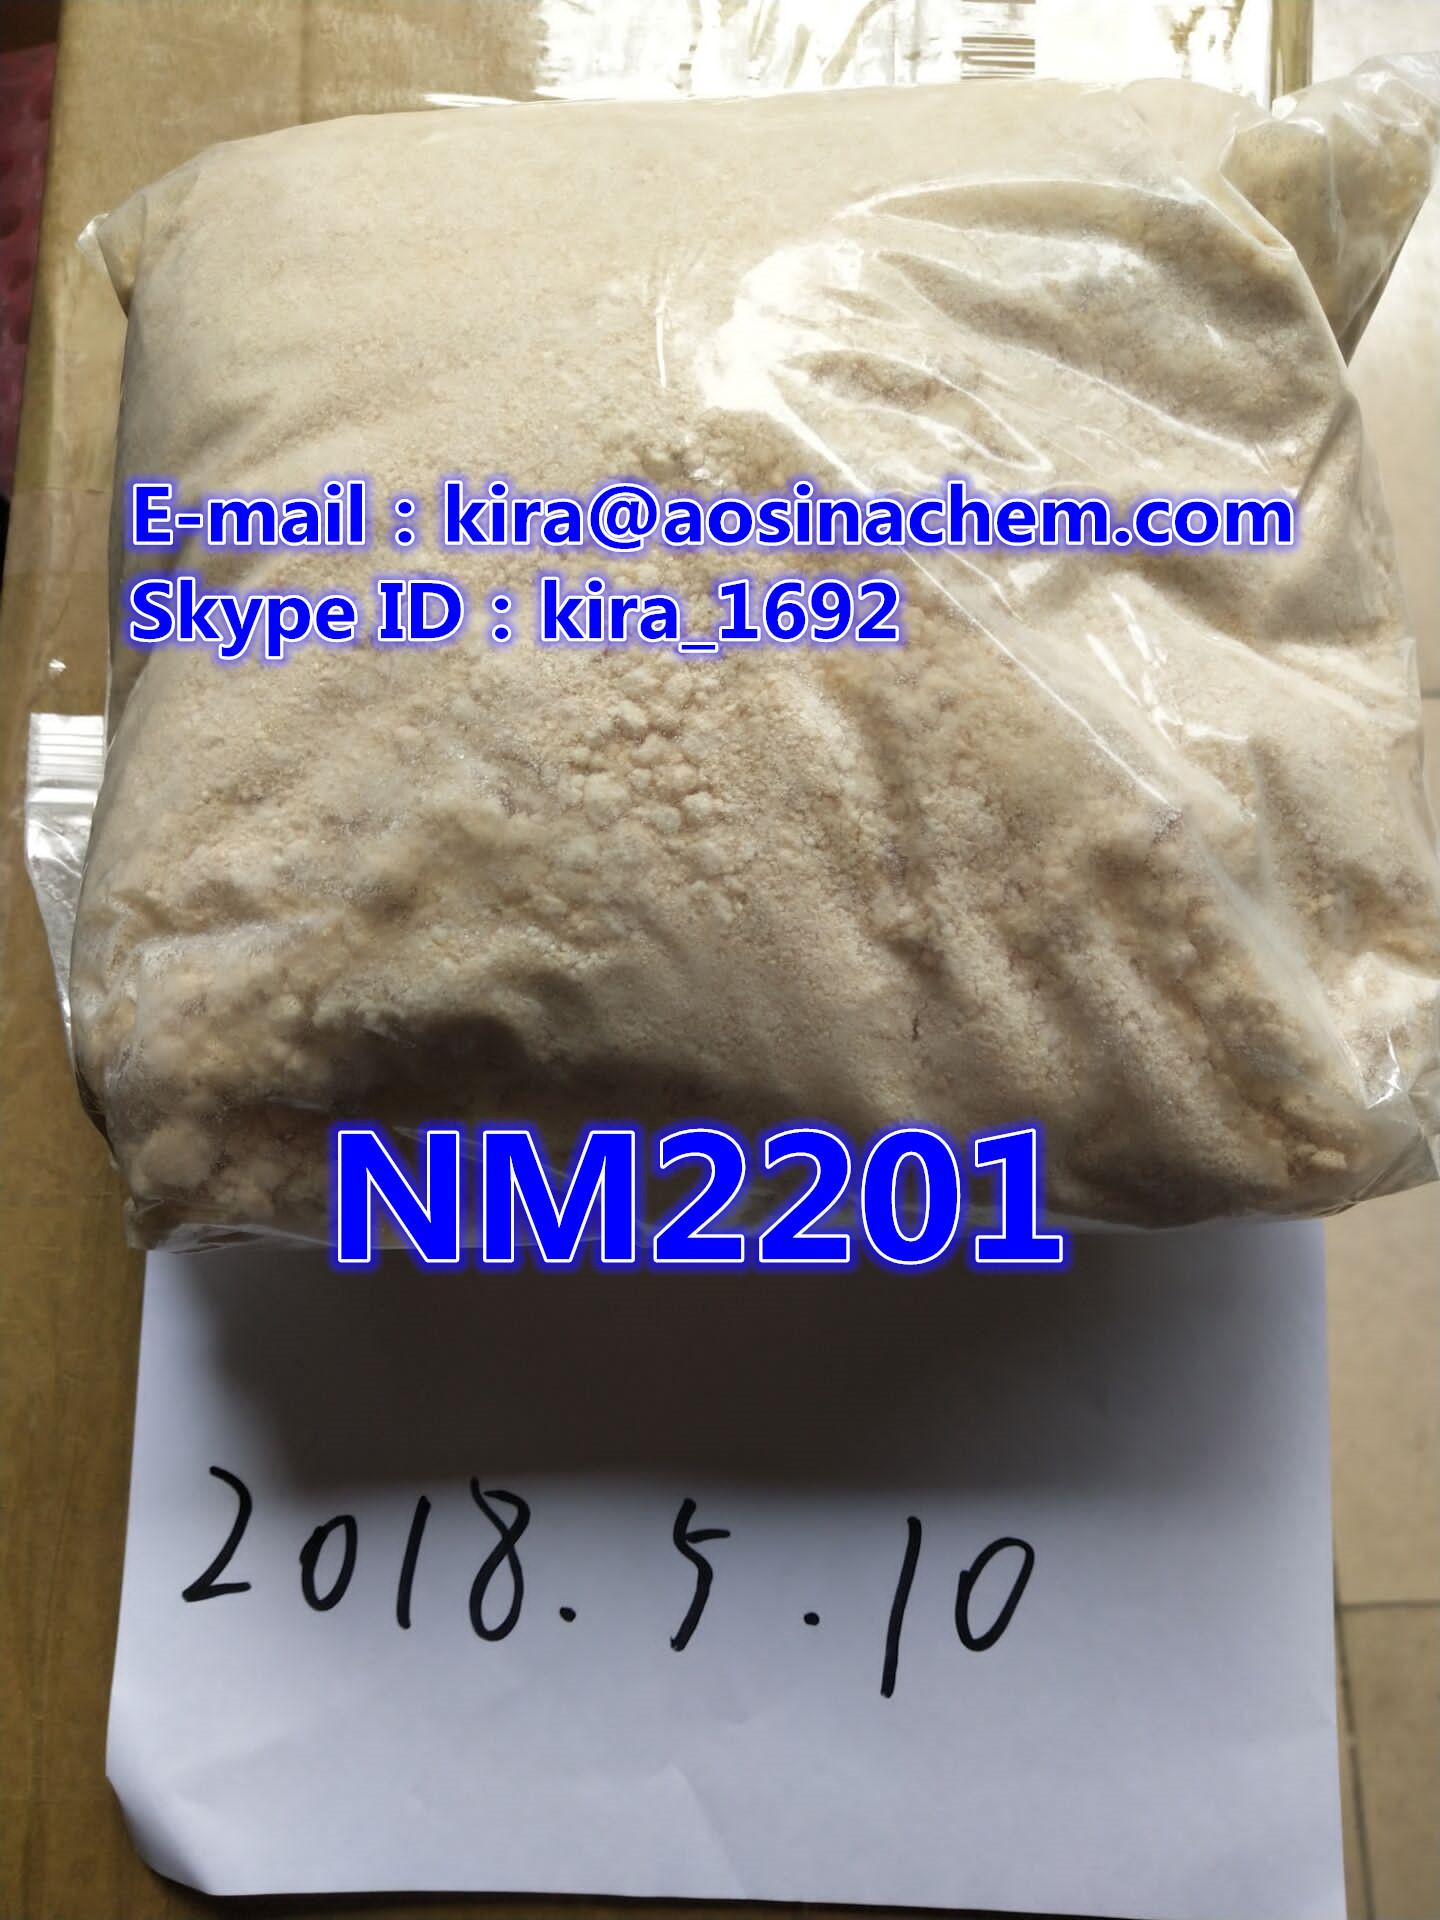 Skype ID:kira_1692 NM2201 nm2201 nm-2201 for sale competitive price legit vendor,kira@aosianchem.com